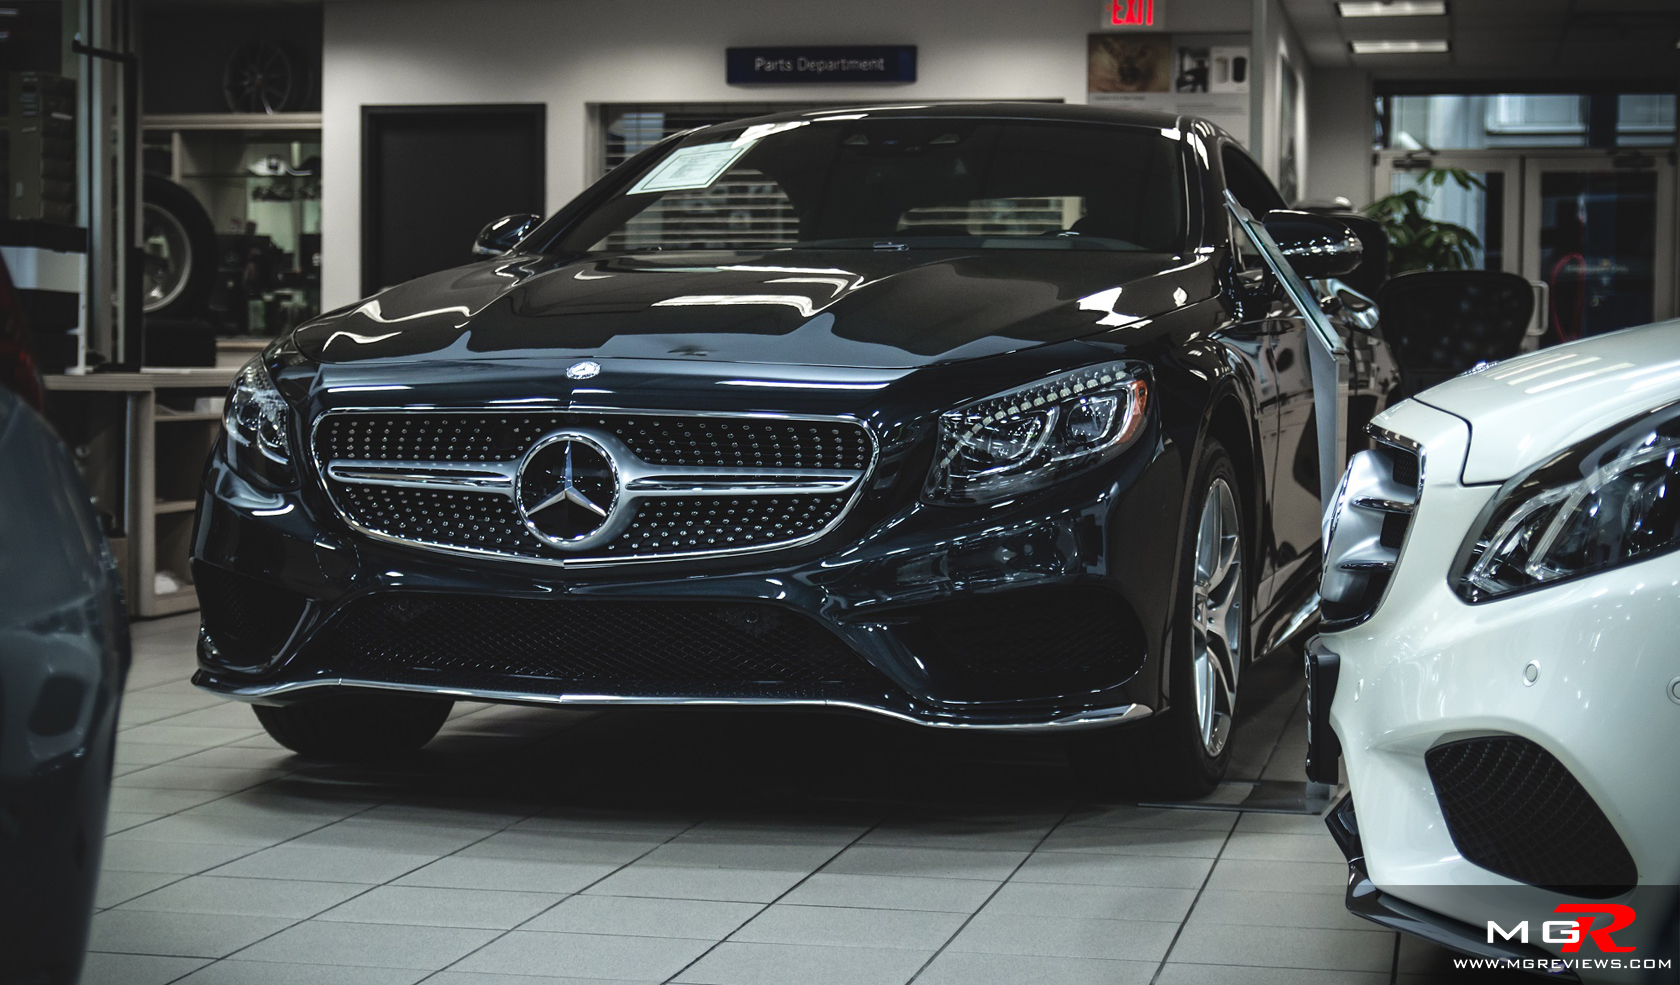 Photos: 2015 Mercedes-Benz S550 Coupe - M.G.Reviews